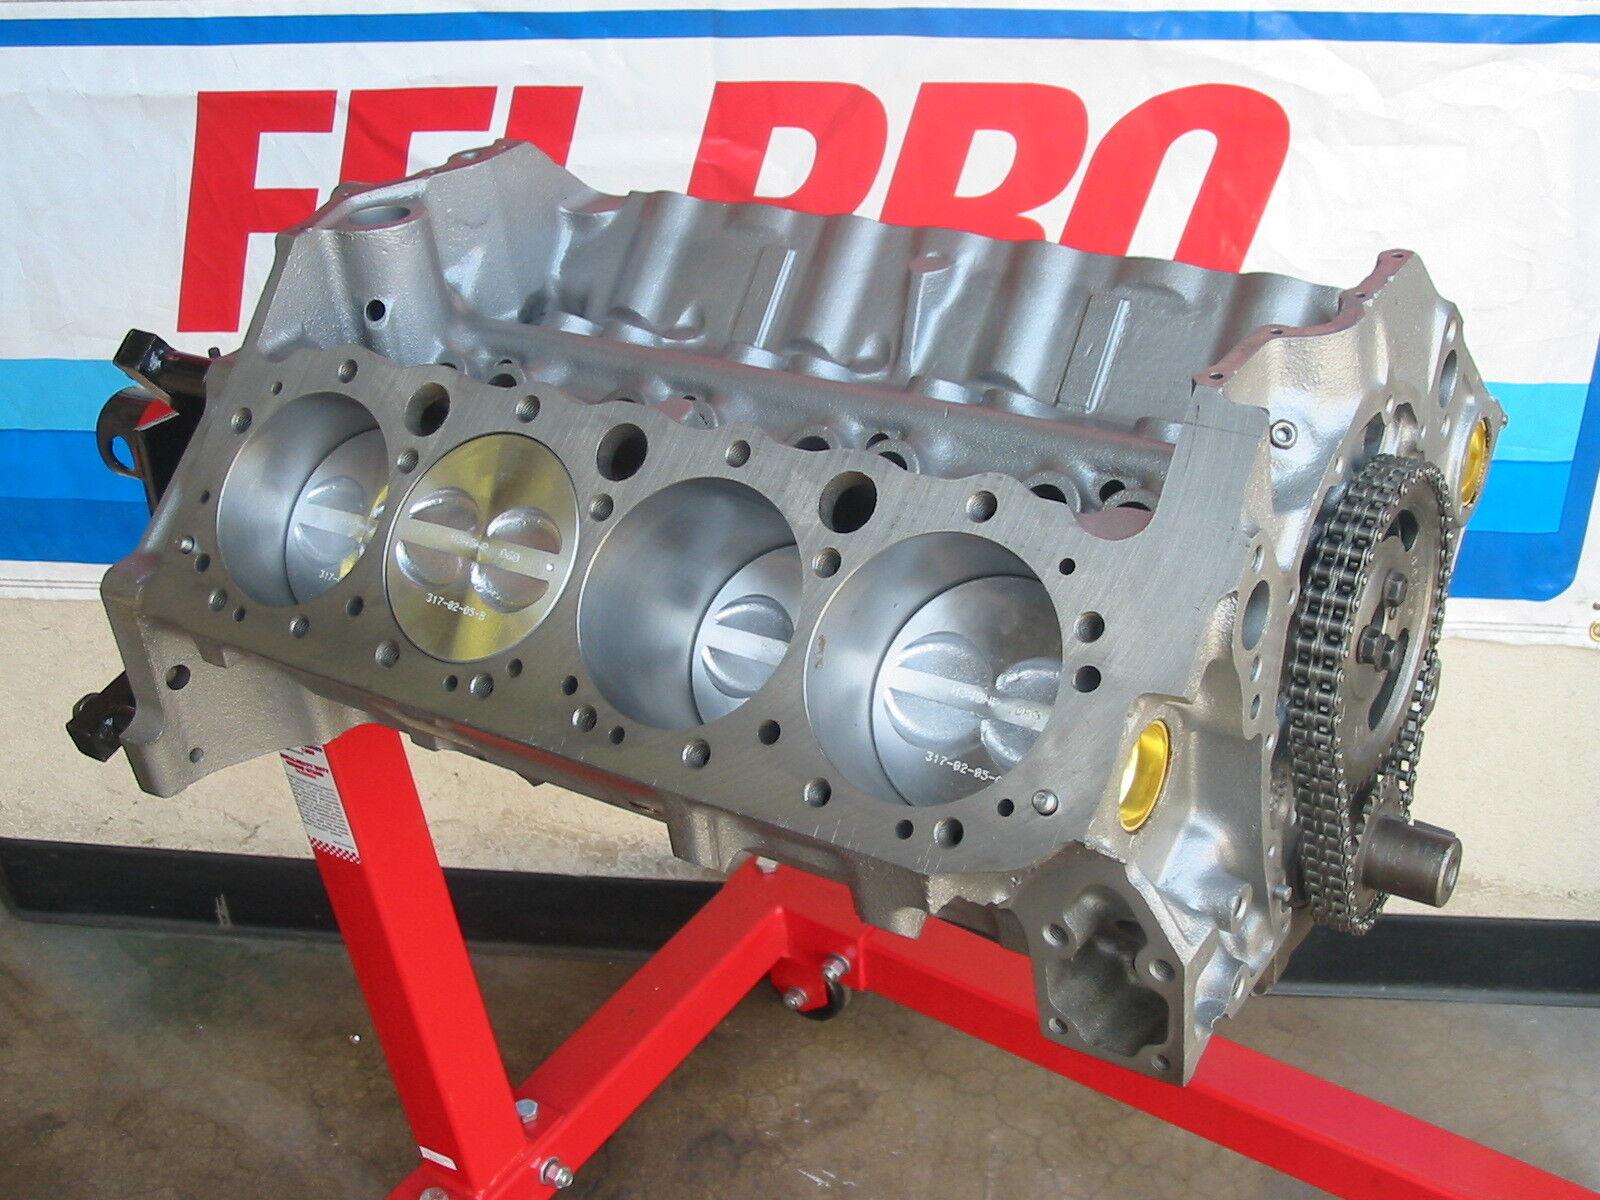 Chevrolet 350 325 Hp High Perf Turn Key Crate Engine